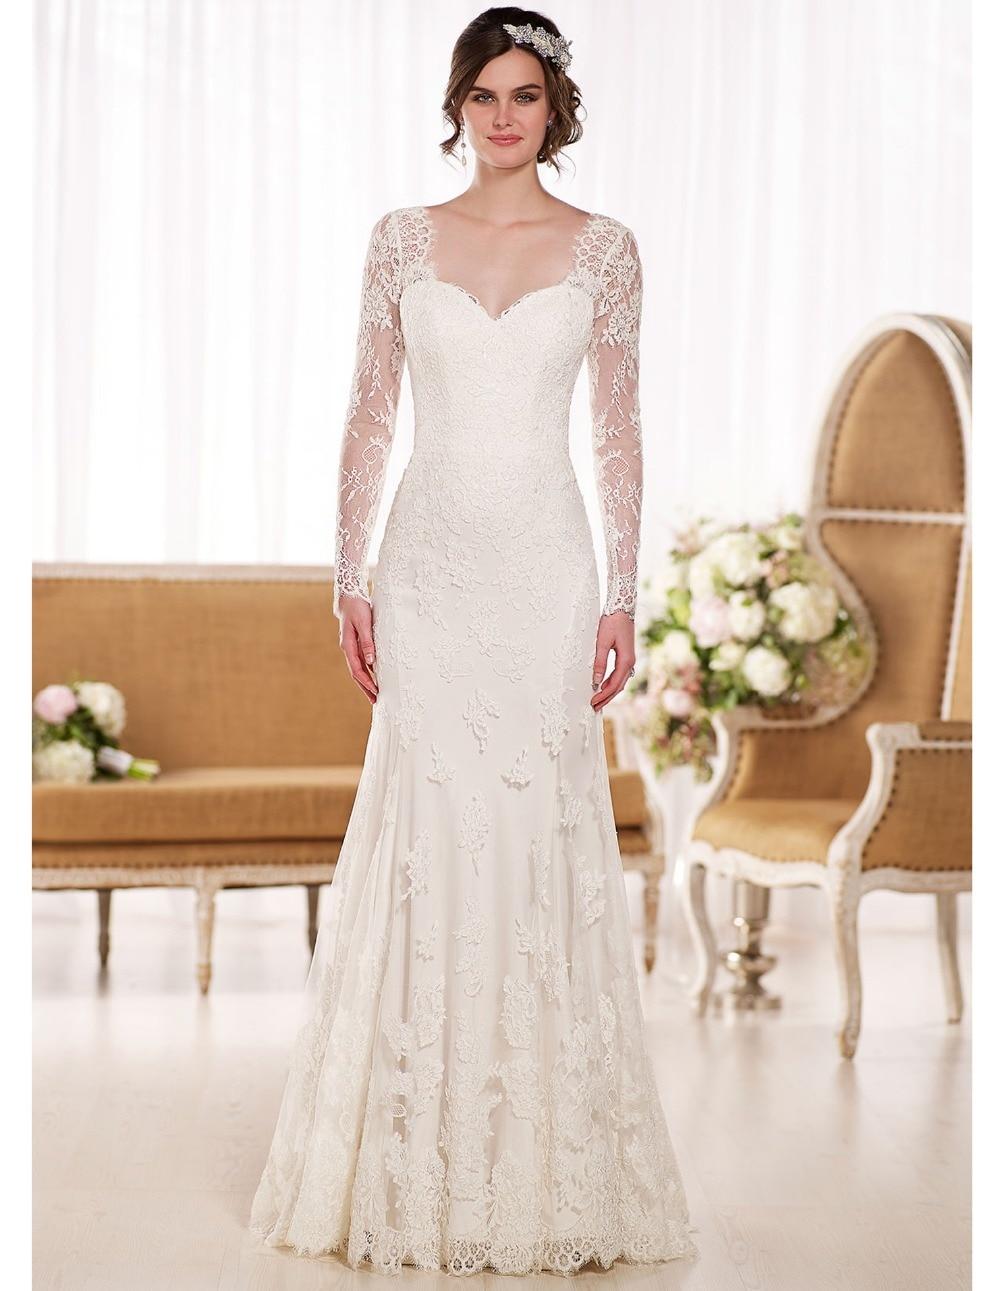 Wedding Dress Jenny Packham Wedding Dresses For Sale popular jenny packham dresses buy cheap lots from china suppliers on aliexpress com